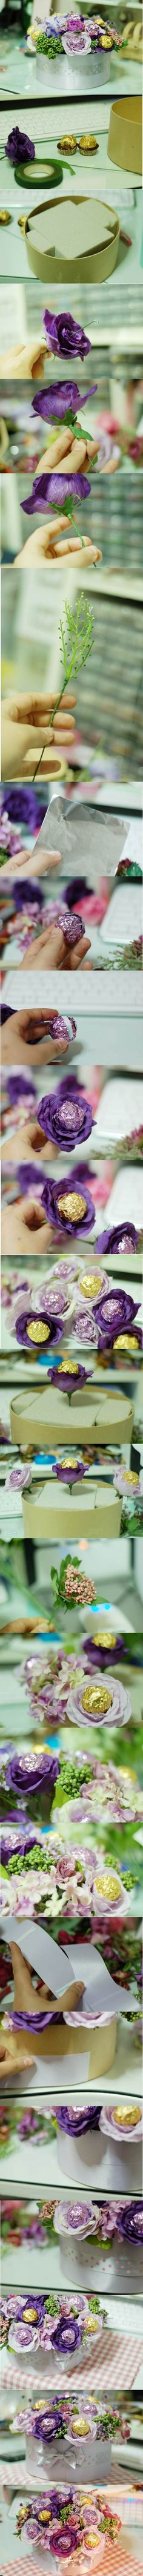 DIY Valentine's Day Chocolate Flower Bouquet   iCreativeIdeas.com LIKE Us on Facebook ==> https://www.facebook.com/icreativeideas